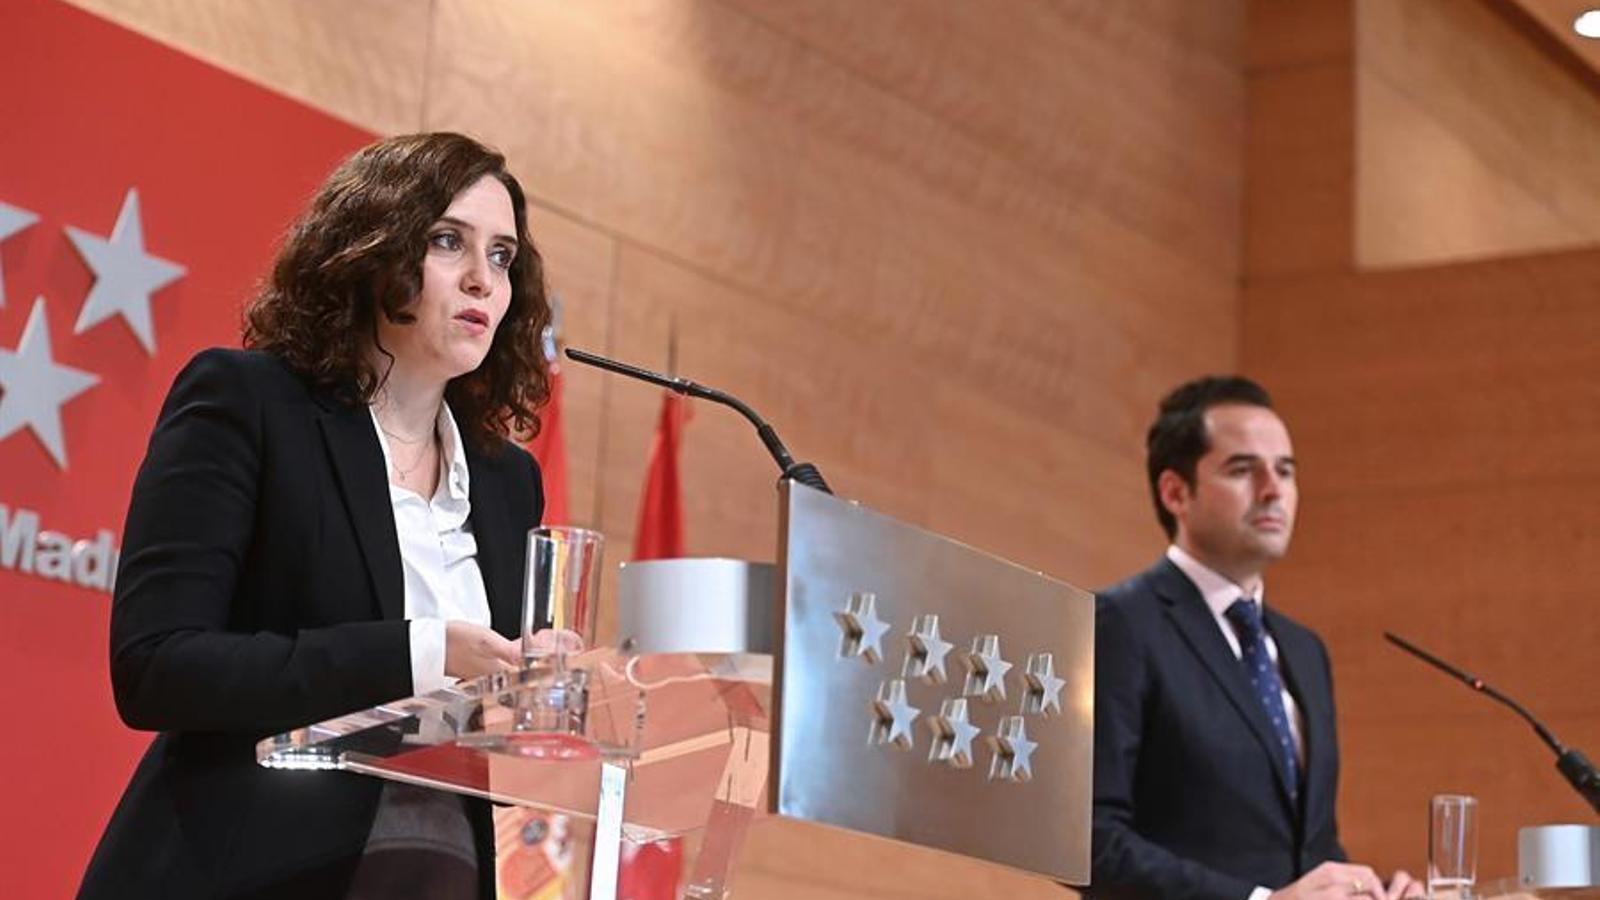 La presidenta de la comunitat de Madrid, Isabel Díaz Ayuso, i el vicepresident, Ignacio Aguado, en roda de premsa aquest dimecres.